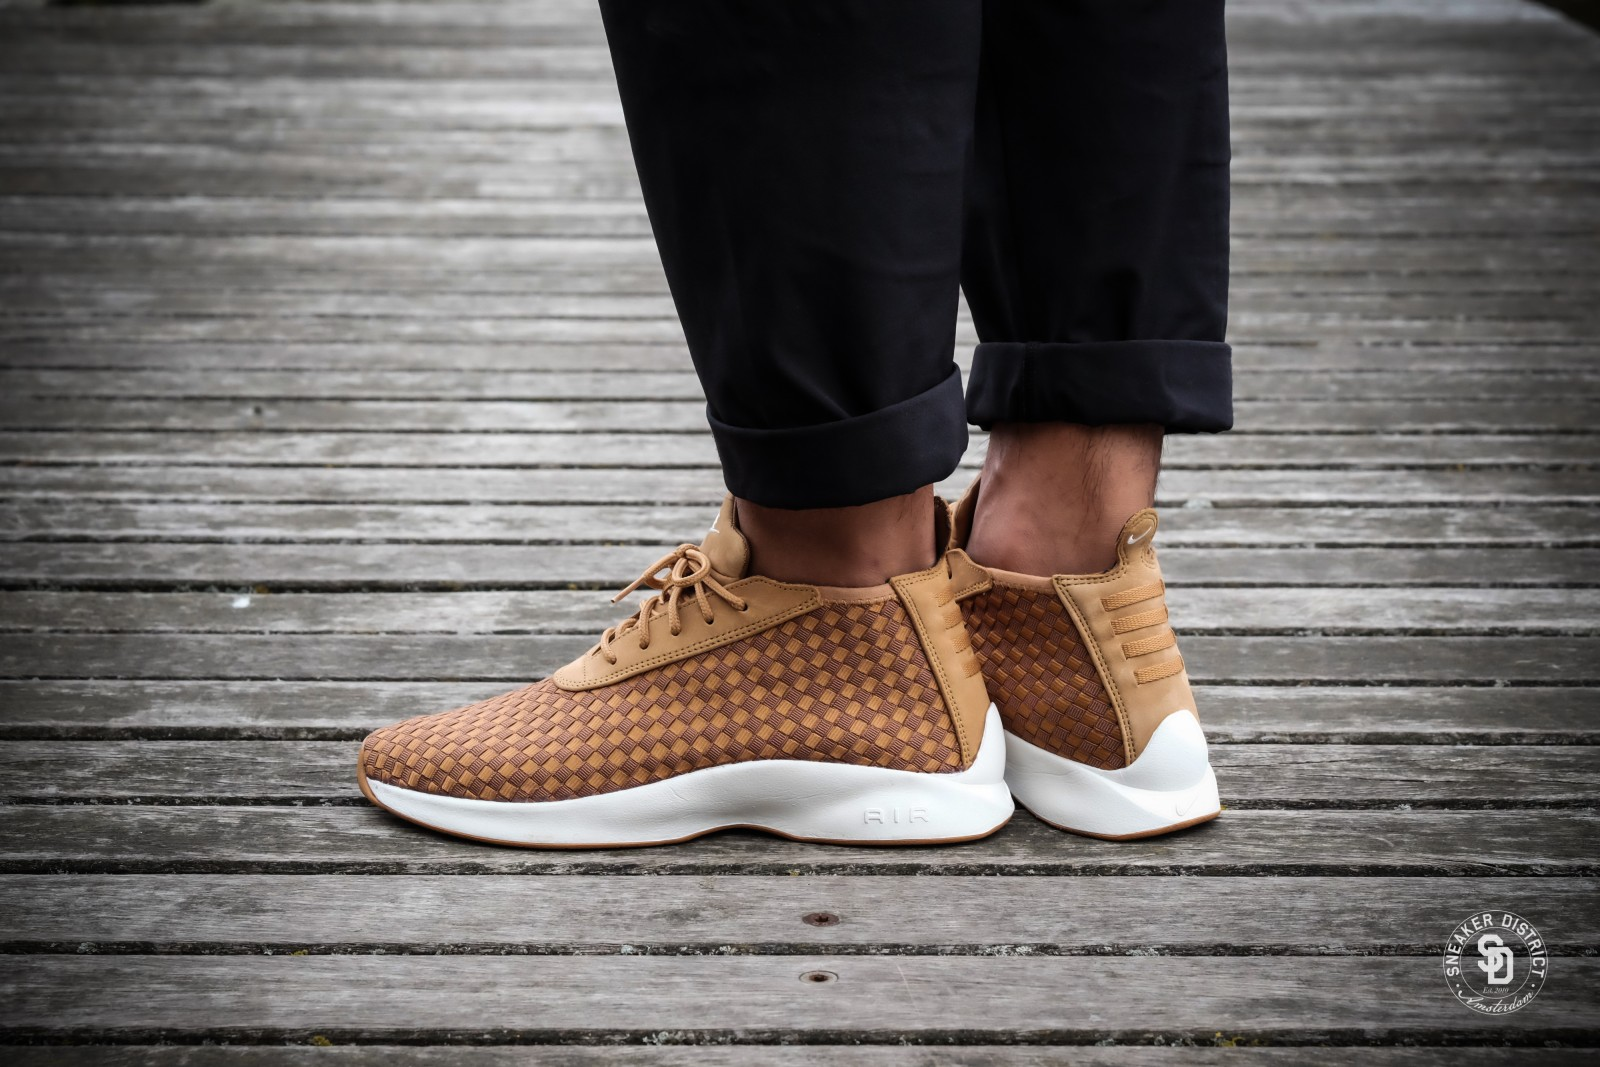 Nike Air Woven Boot Flax Ale Brown Gum Sneakers Bestellen